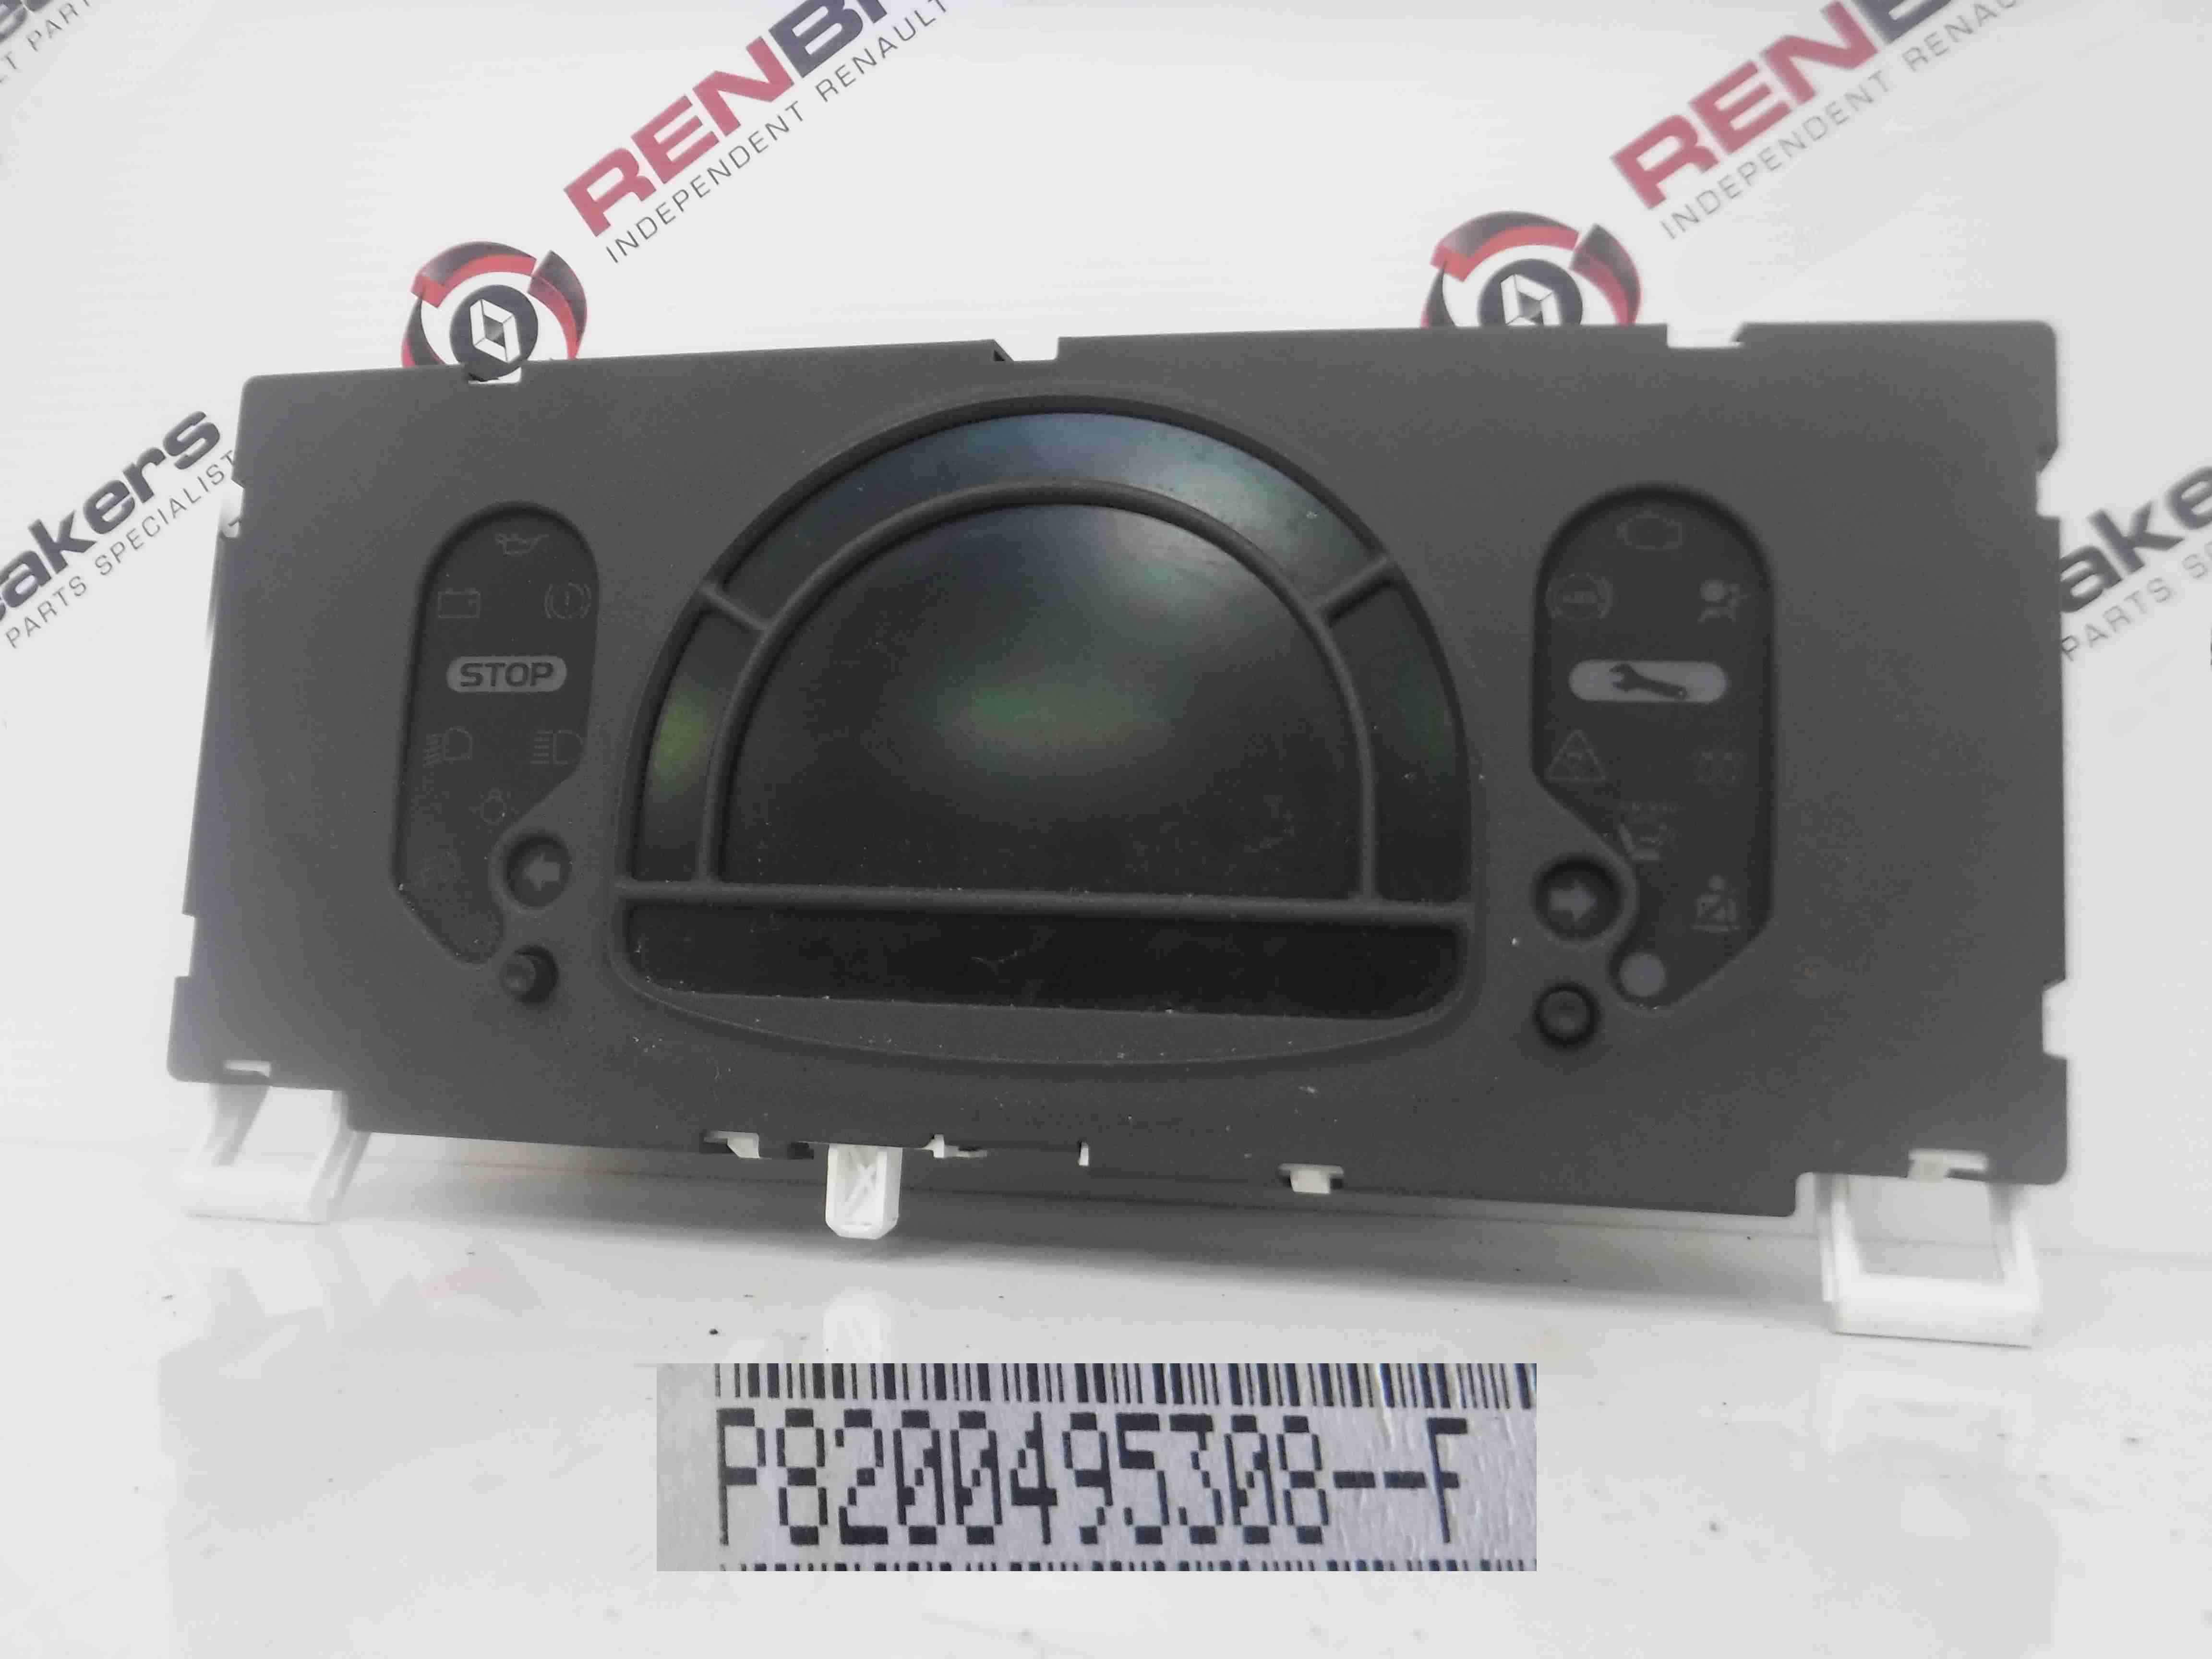 Renault Modus 2004-2008 1.5 dCi Instrument Panel Dials Gauges Clocks 8200495308